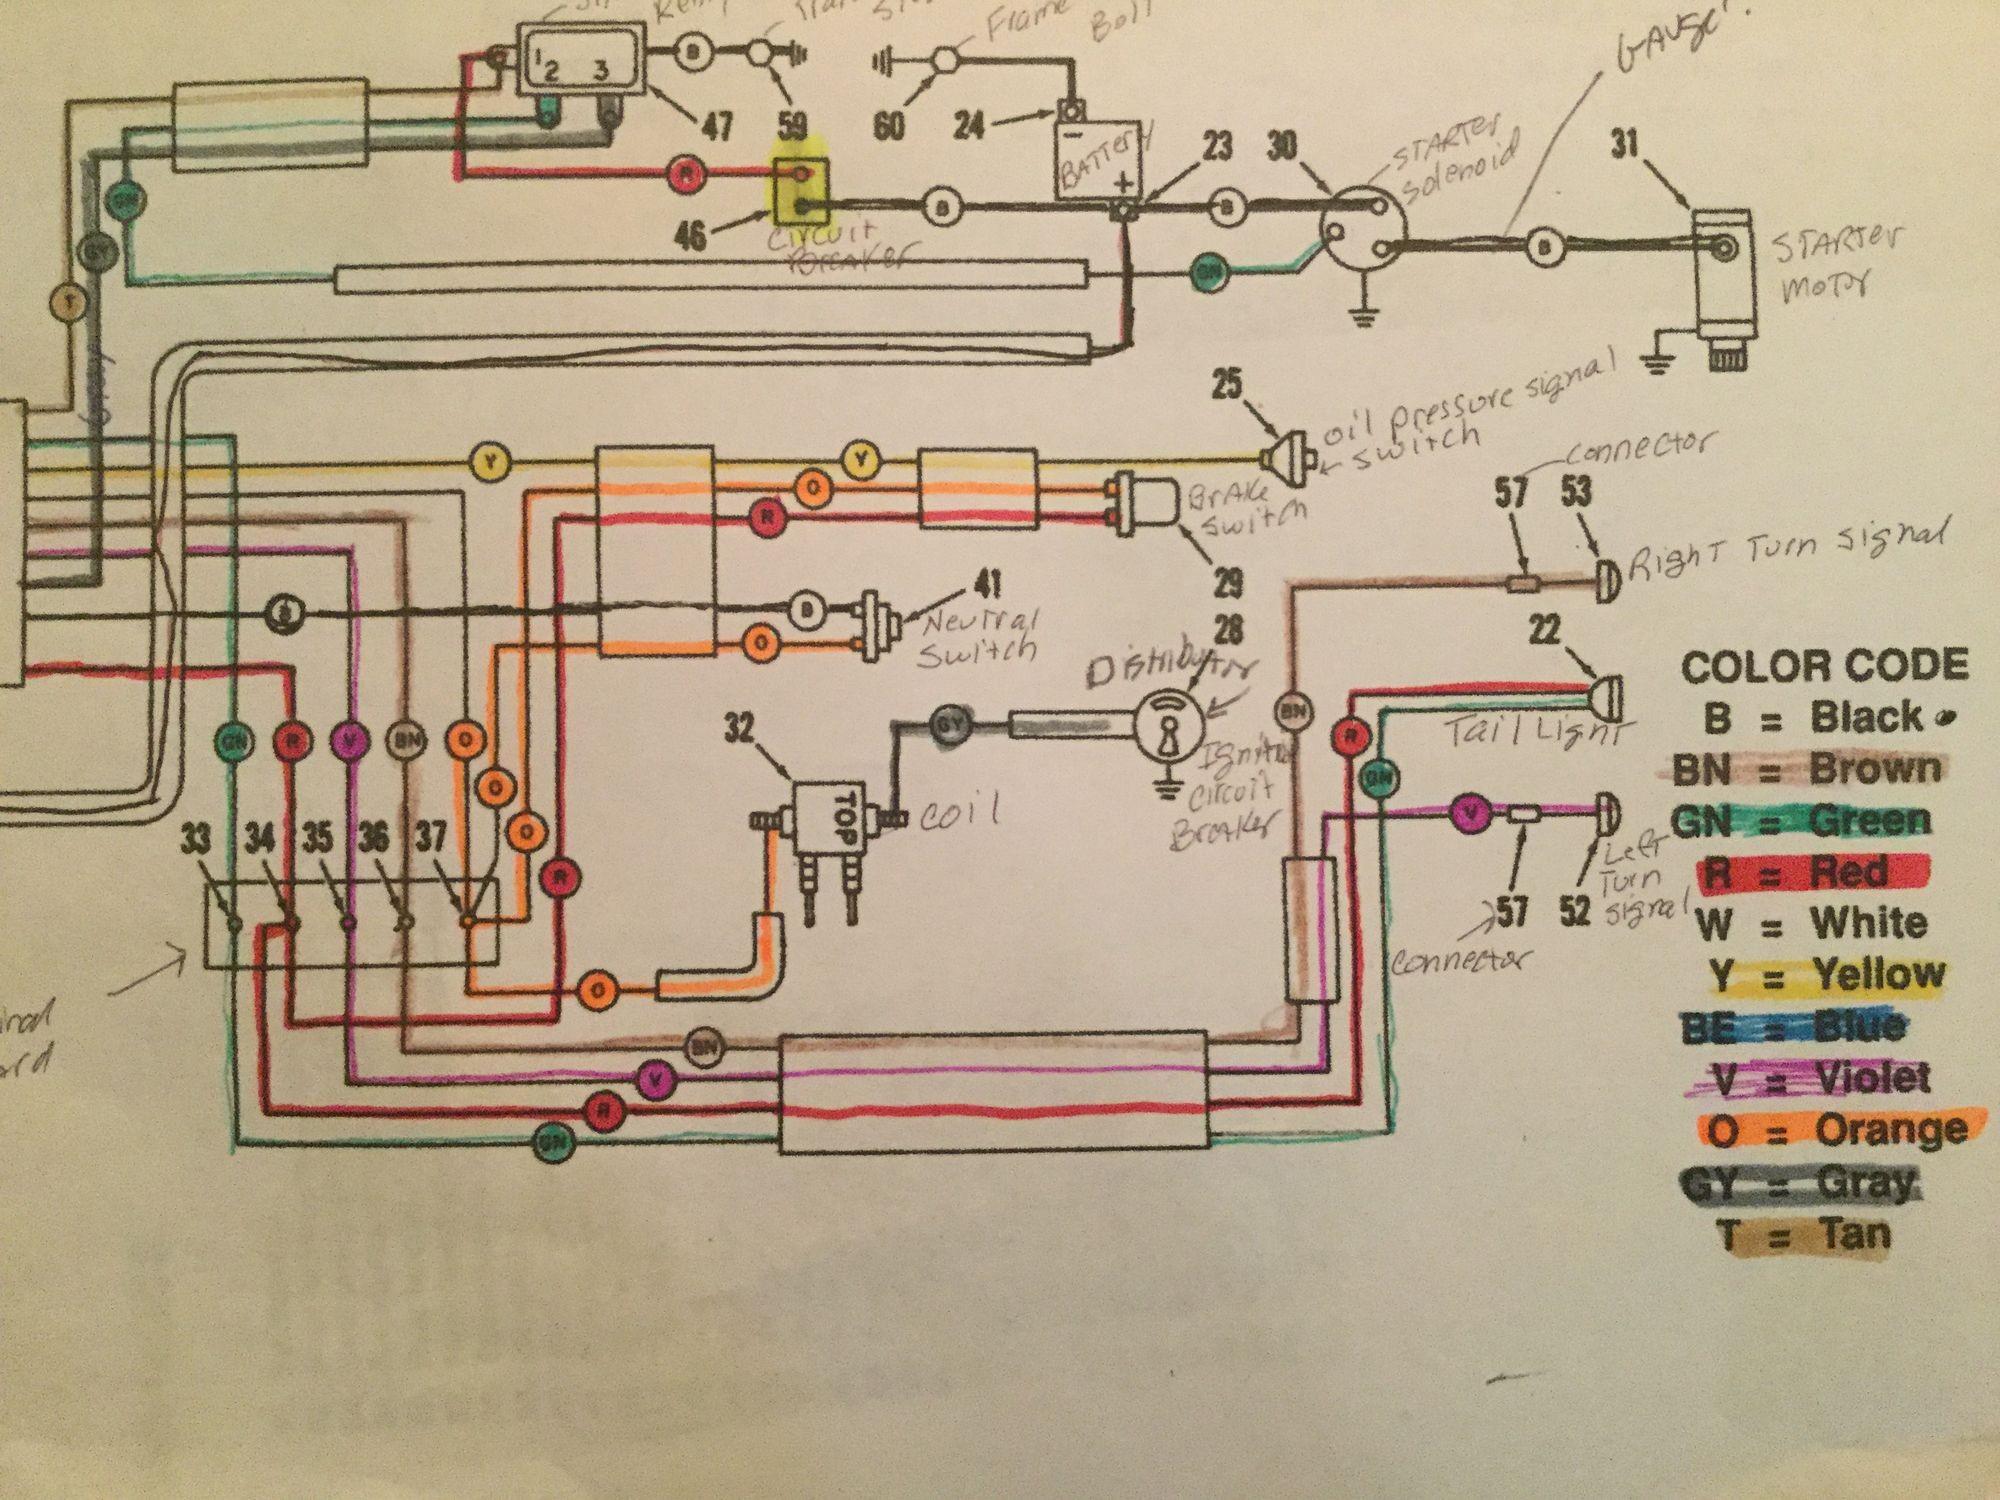 1970 Harley Shovelhead Wiring Schematic Free Diagram] 1973 Flh Wiring Diagram Dash Full Version Hd